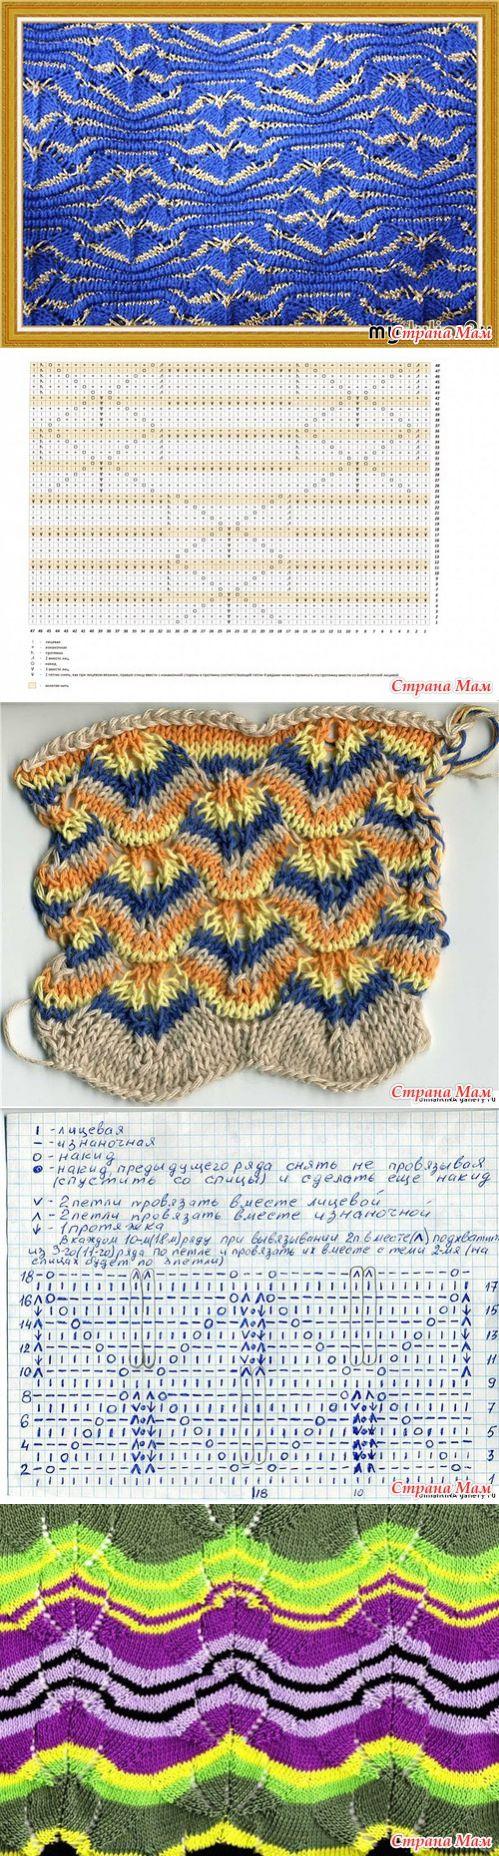 Knitting & Crocheting jakarlı ve ajurlu örnekler